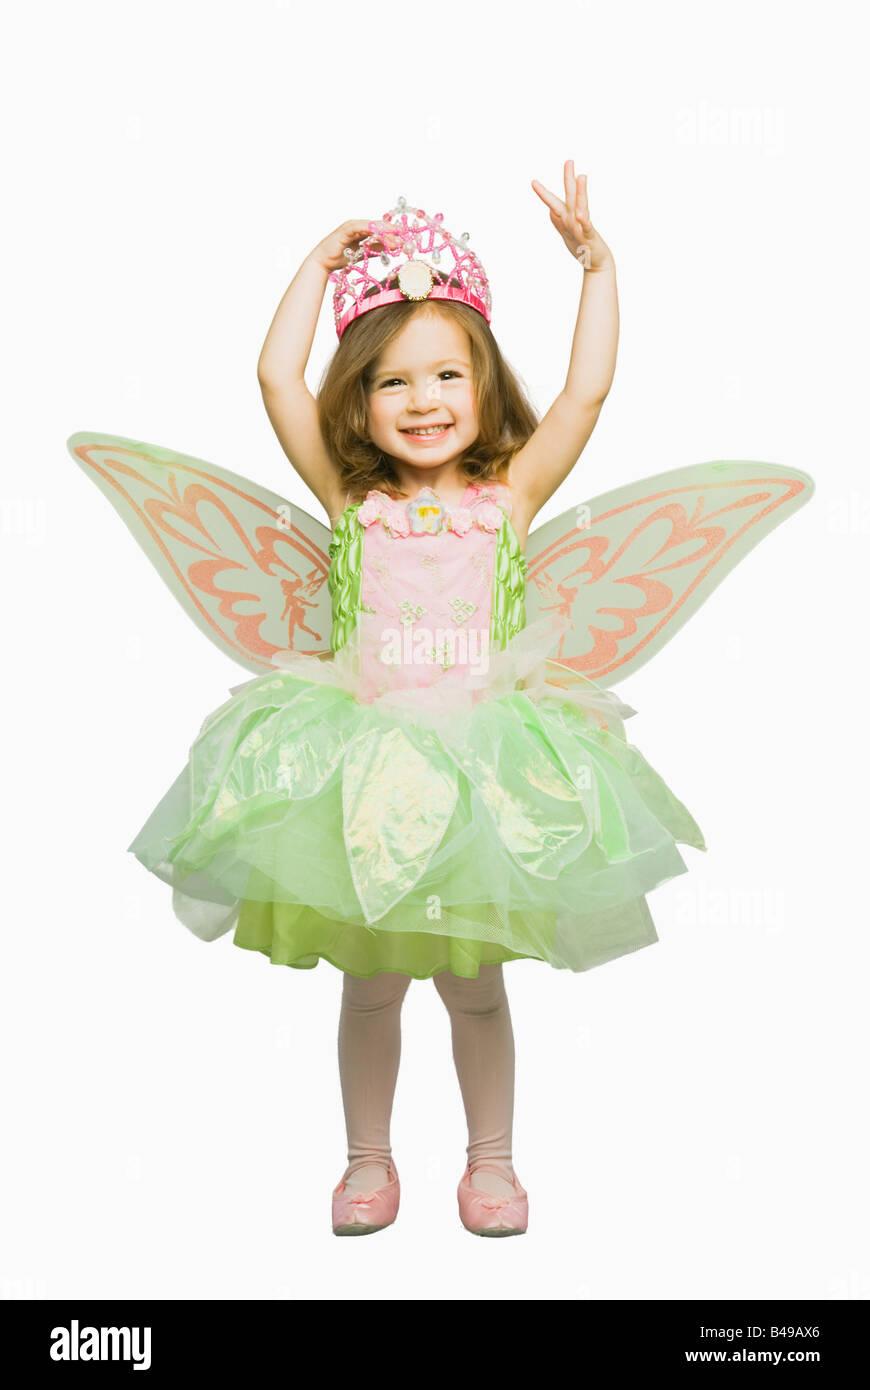 Girl in fairy costume Photo Stock